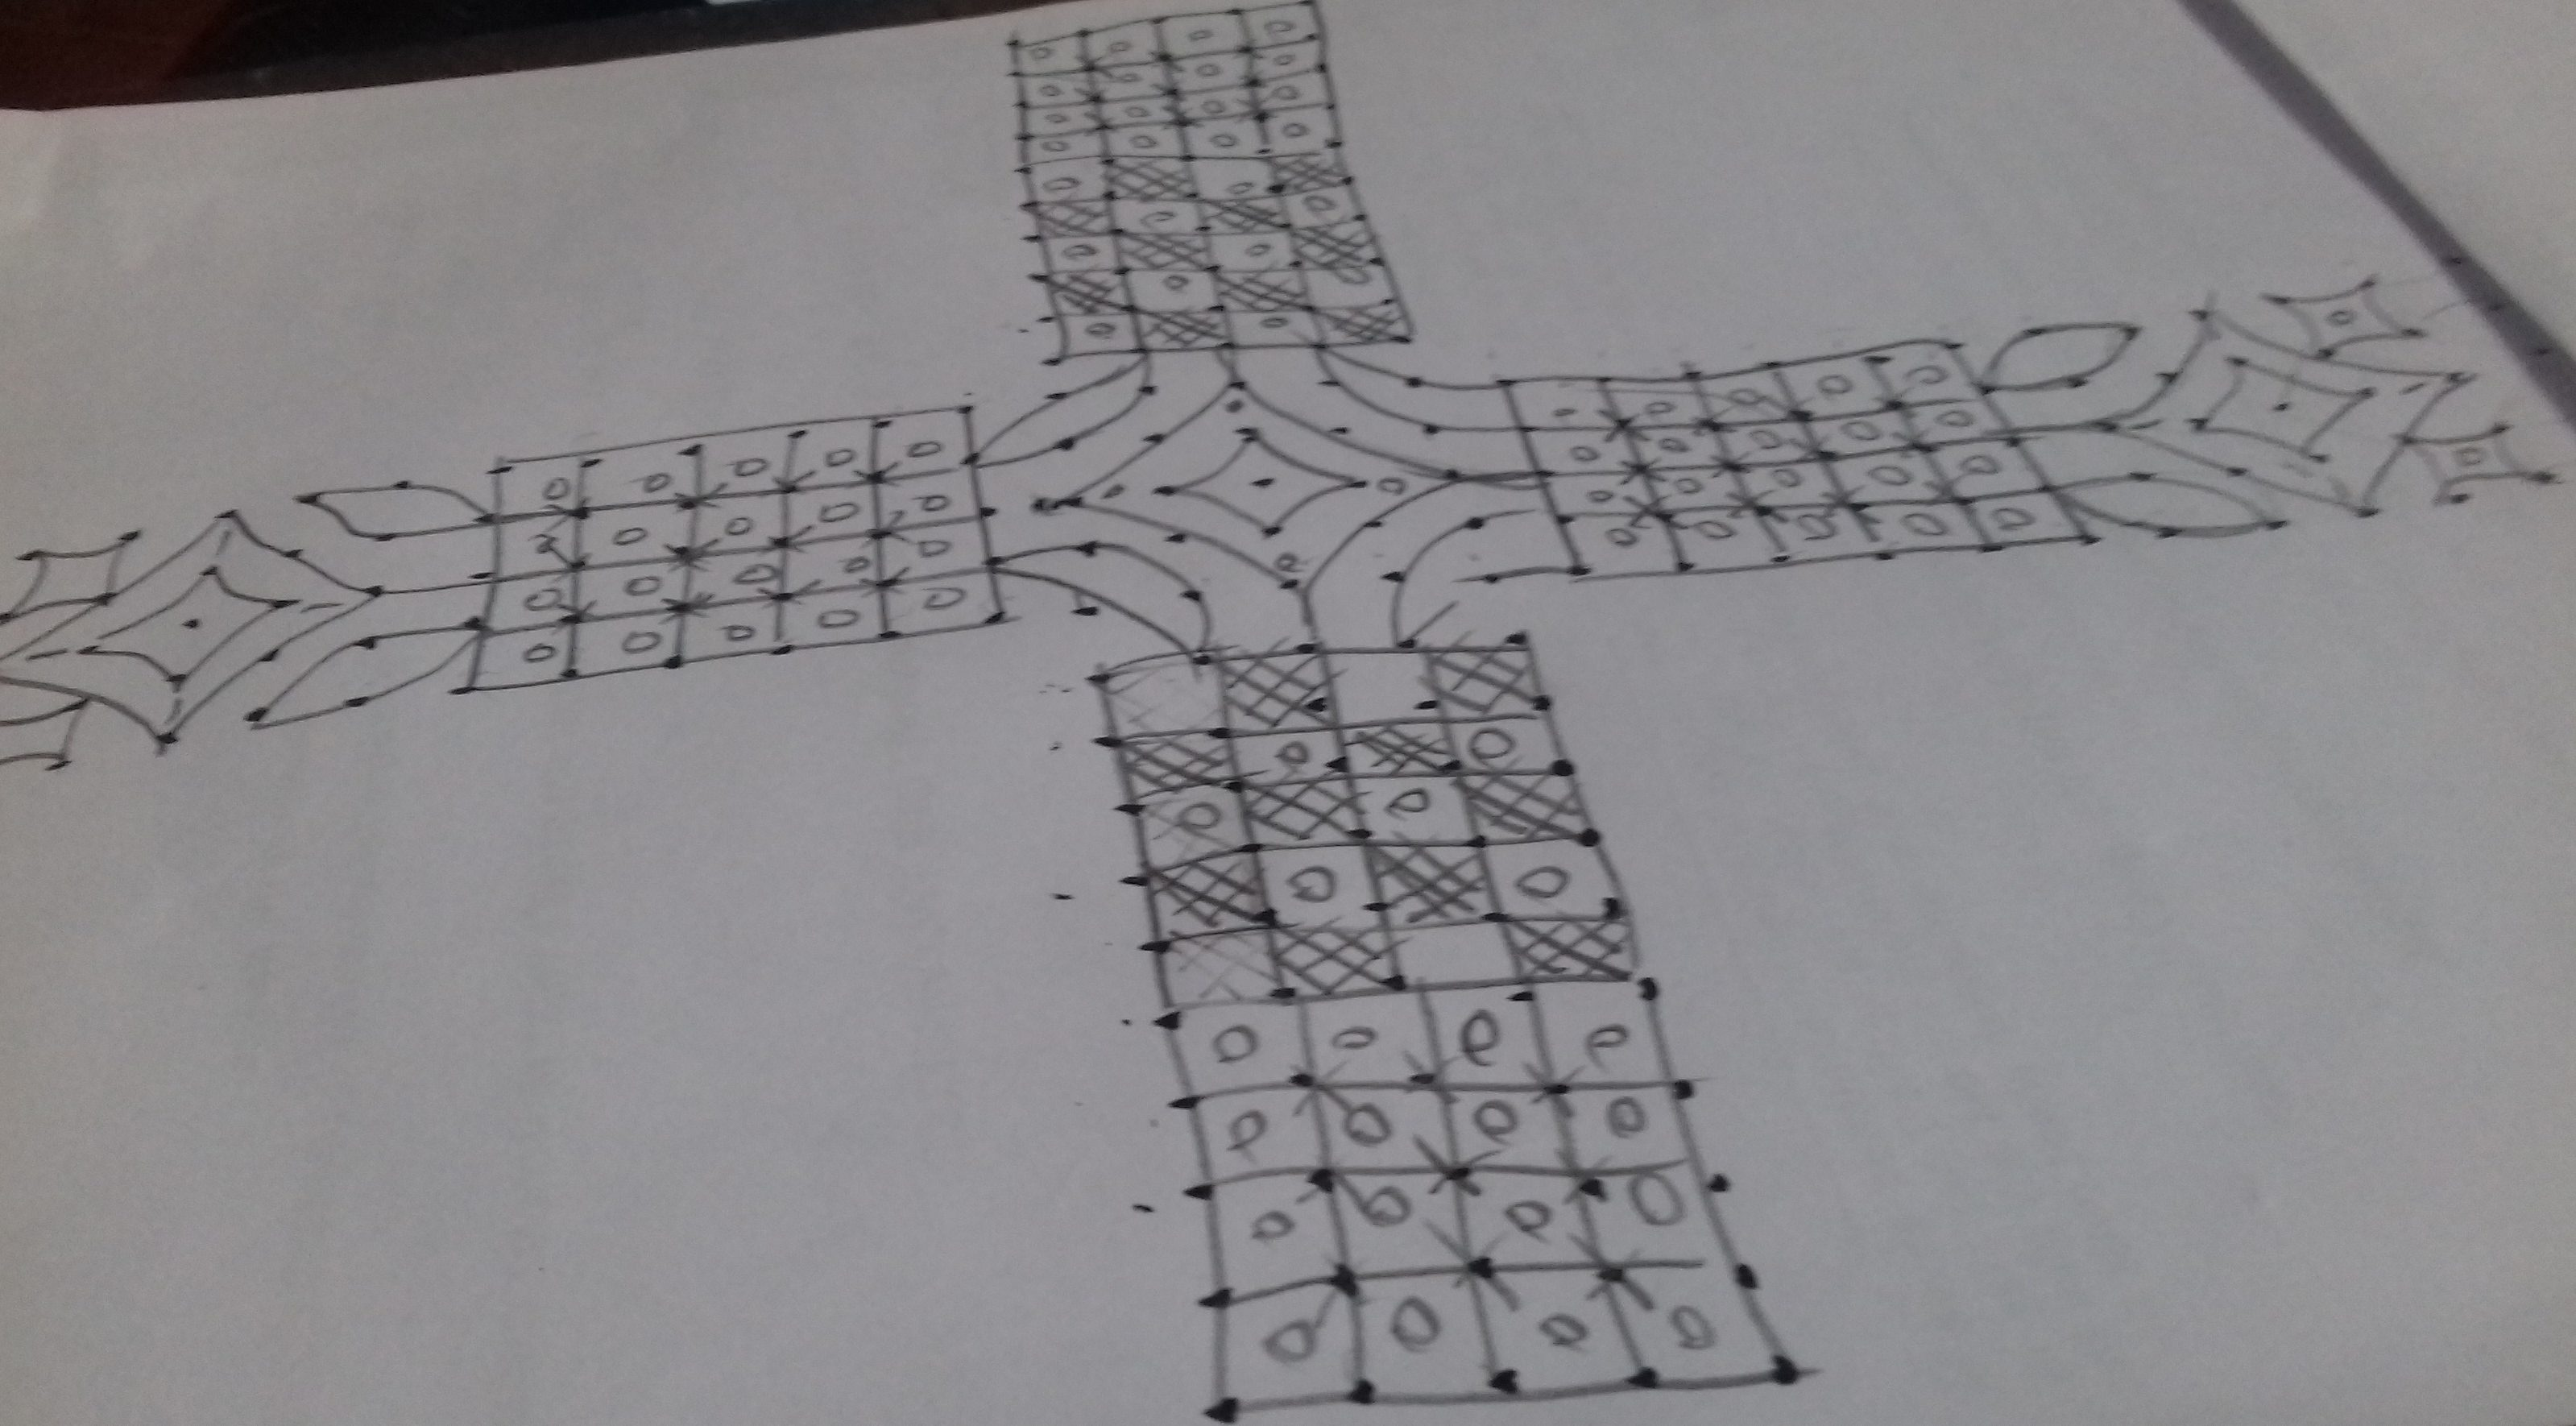 design kolam || 25 dots contest kolam